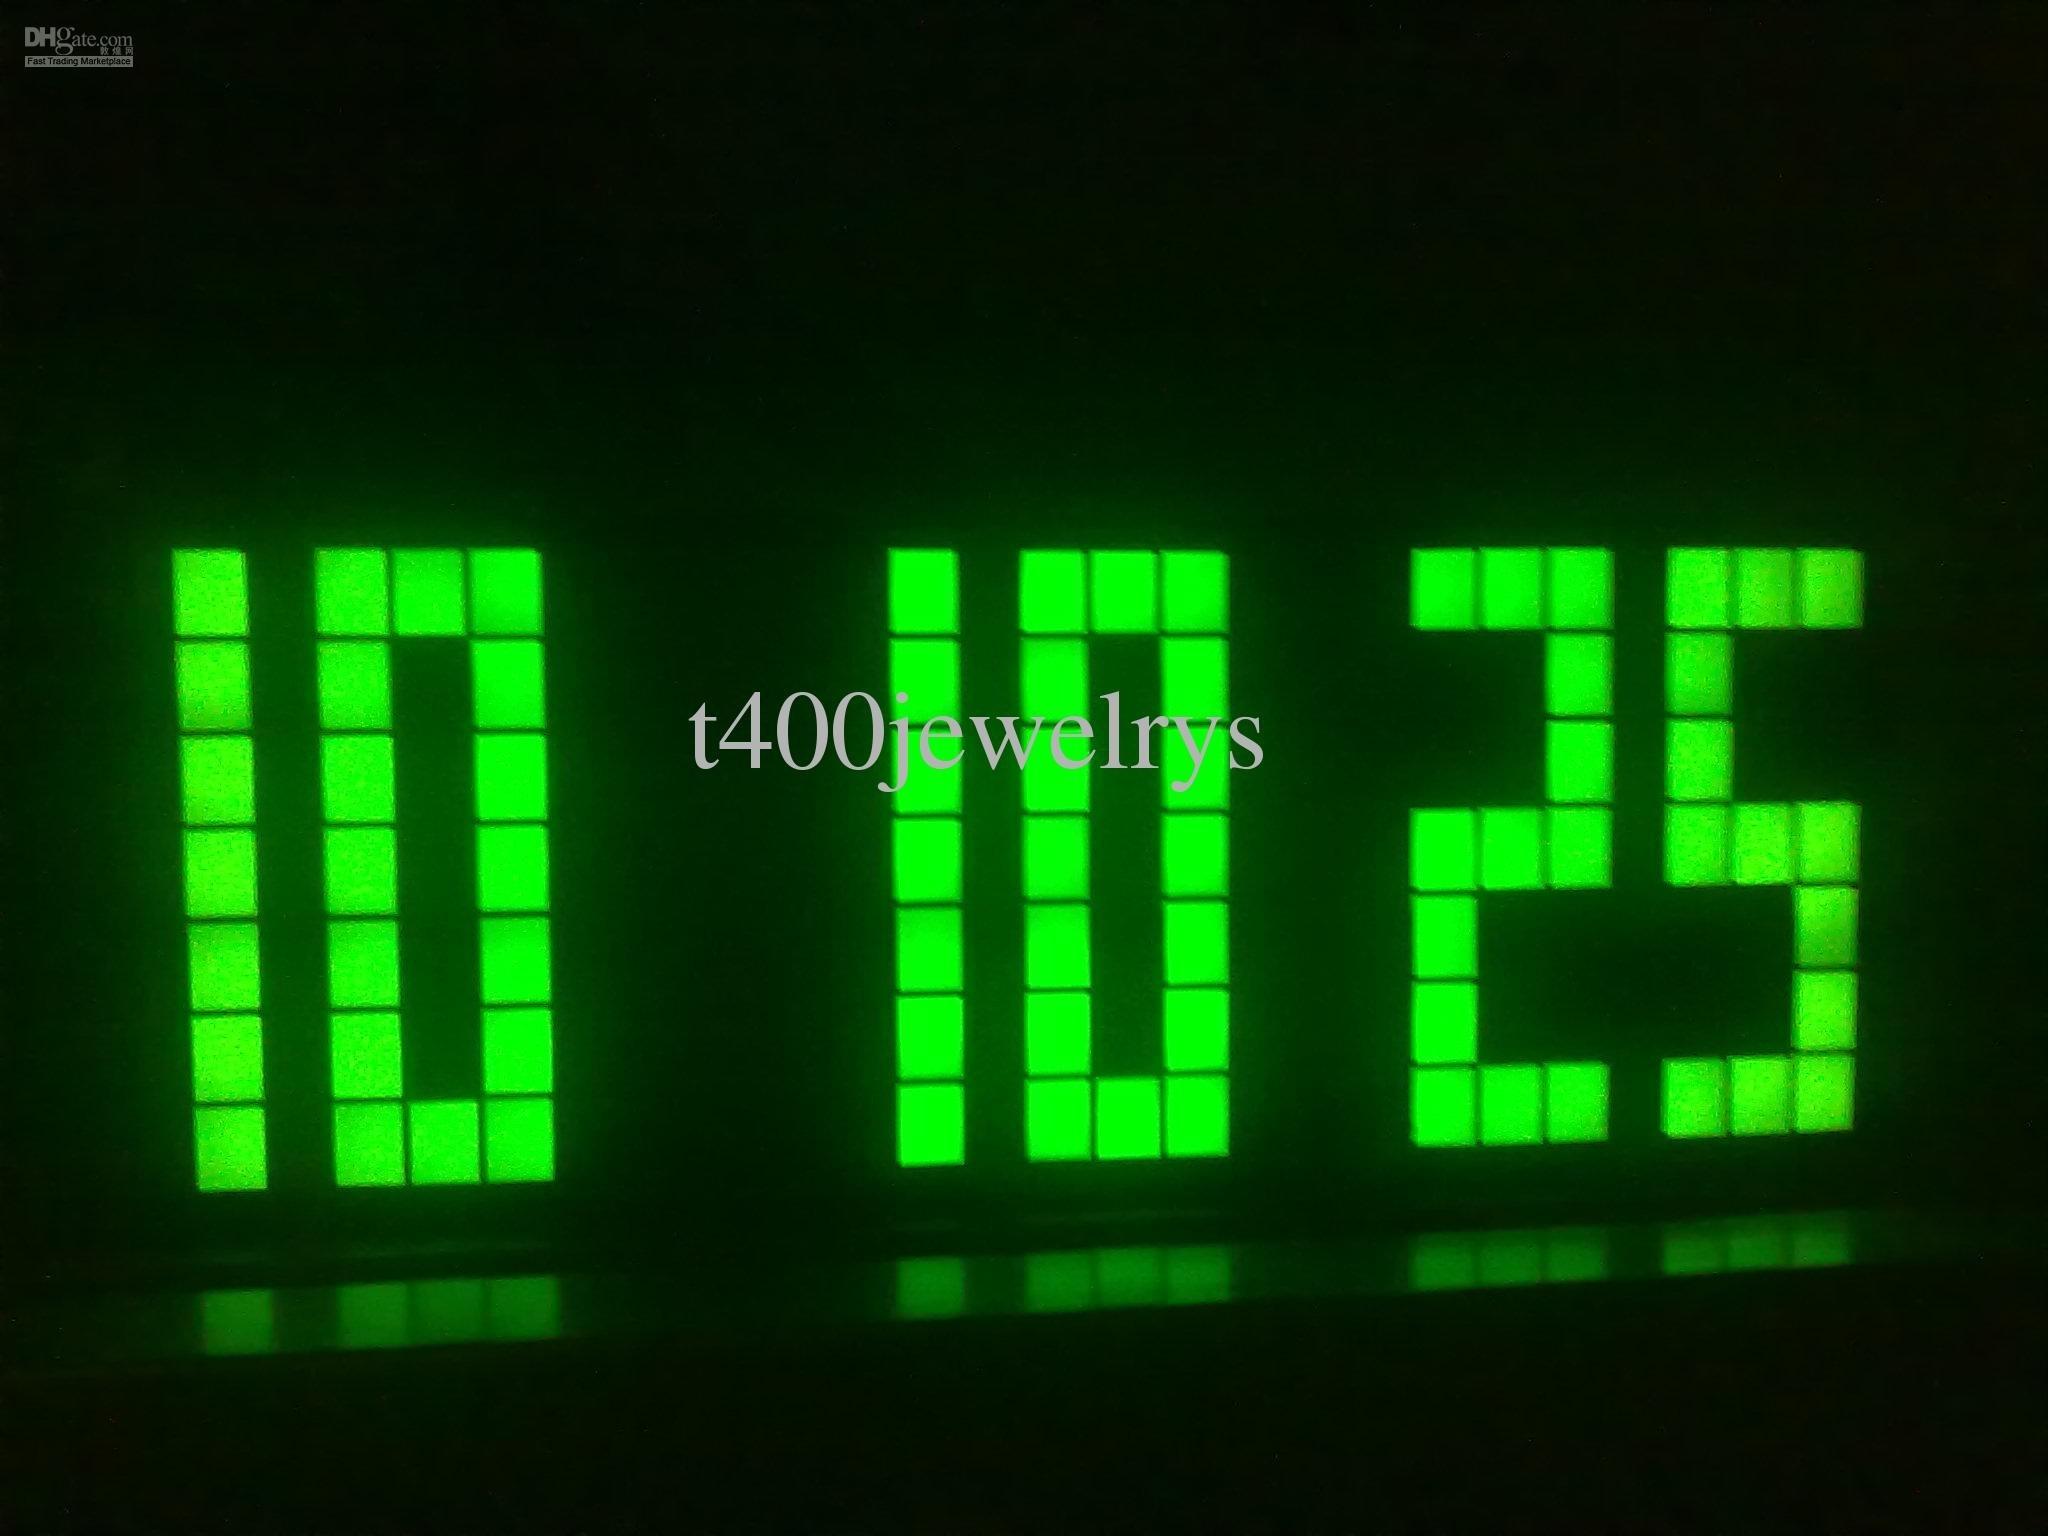 2048X1536Px Free Countdown Wallpaper - Wallpapersafari_Countdown Calendar To Retirement Desktop